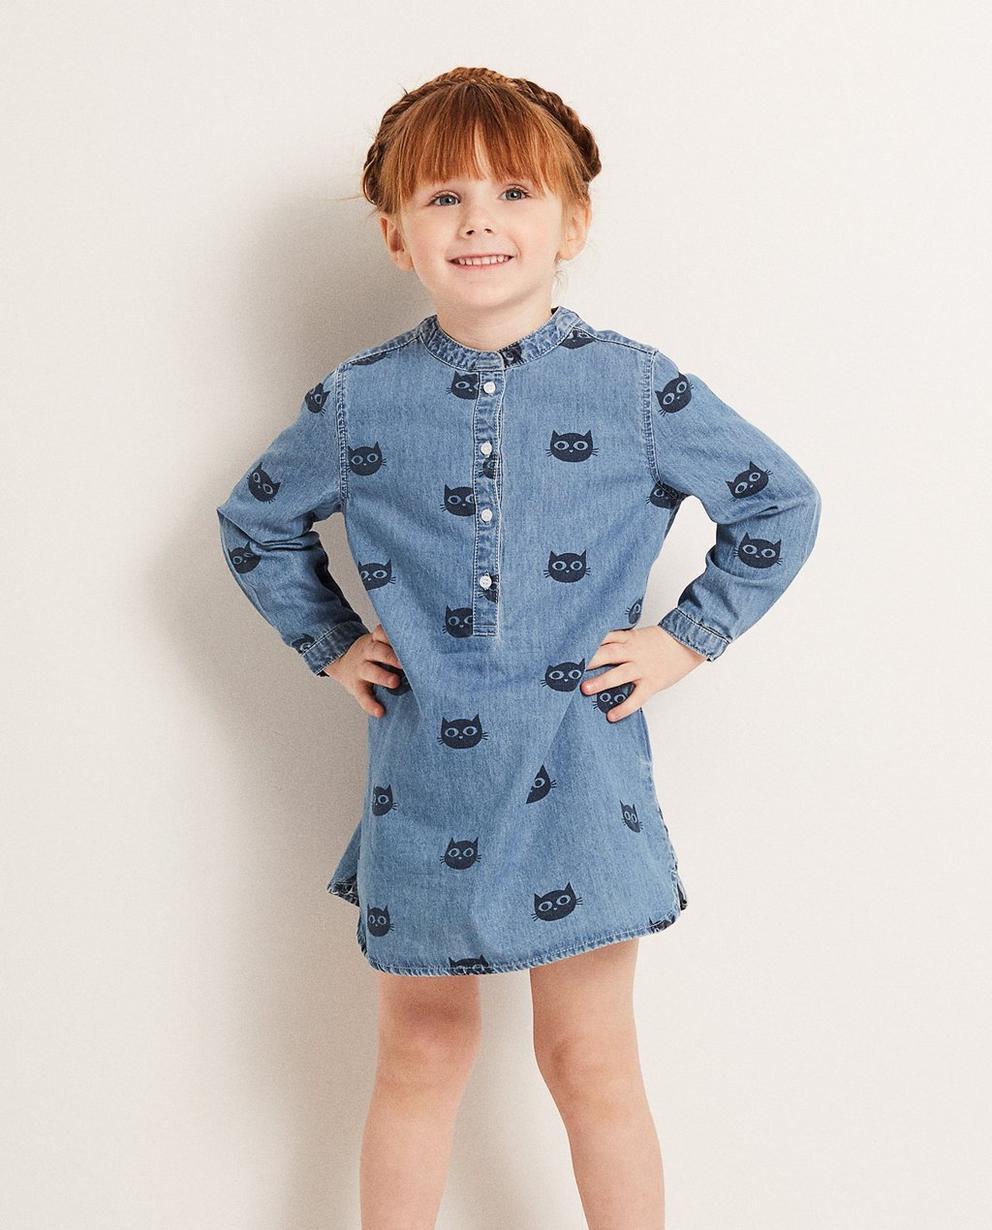 Kleider - AO1 - Jeanskleid mit Katzenprint